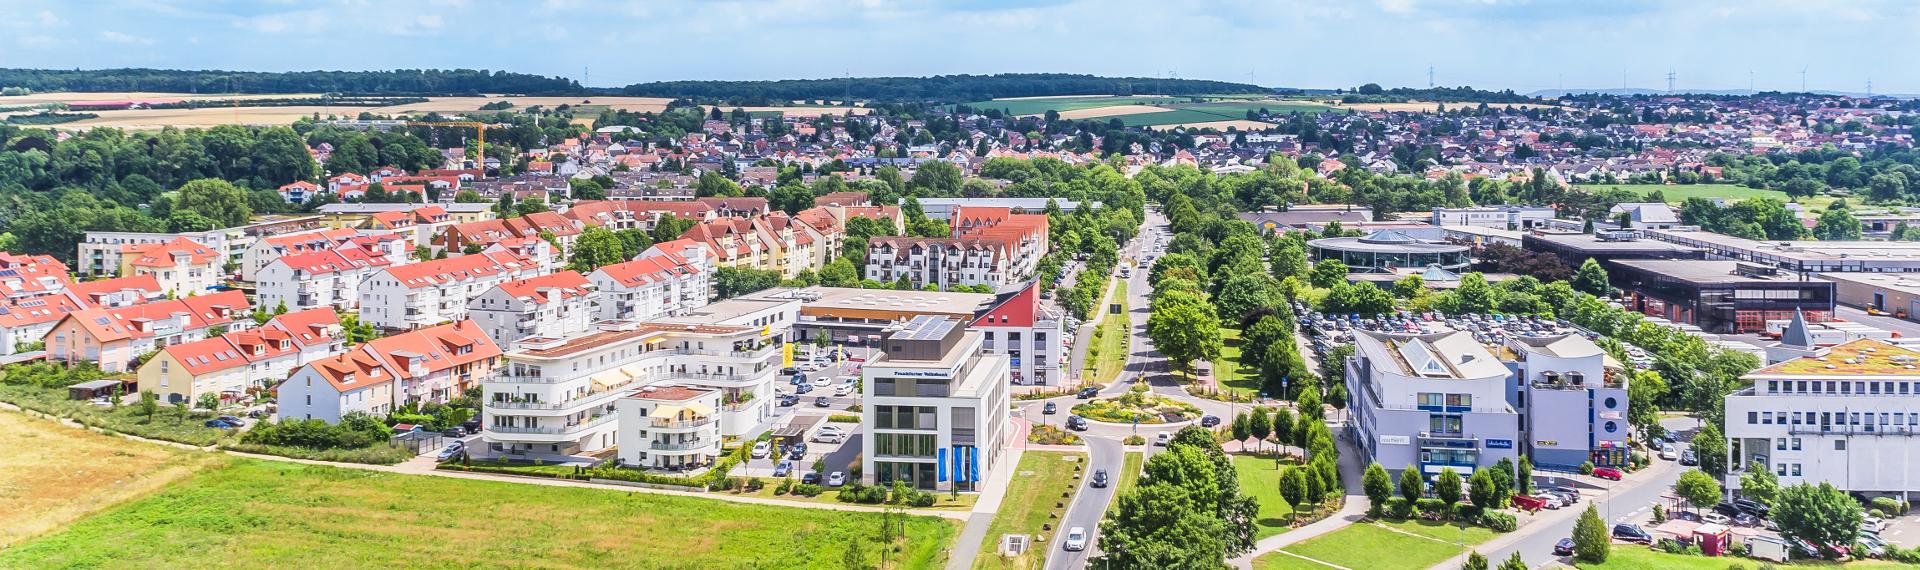 Luftbildaufnahme 2